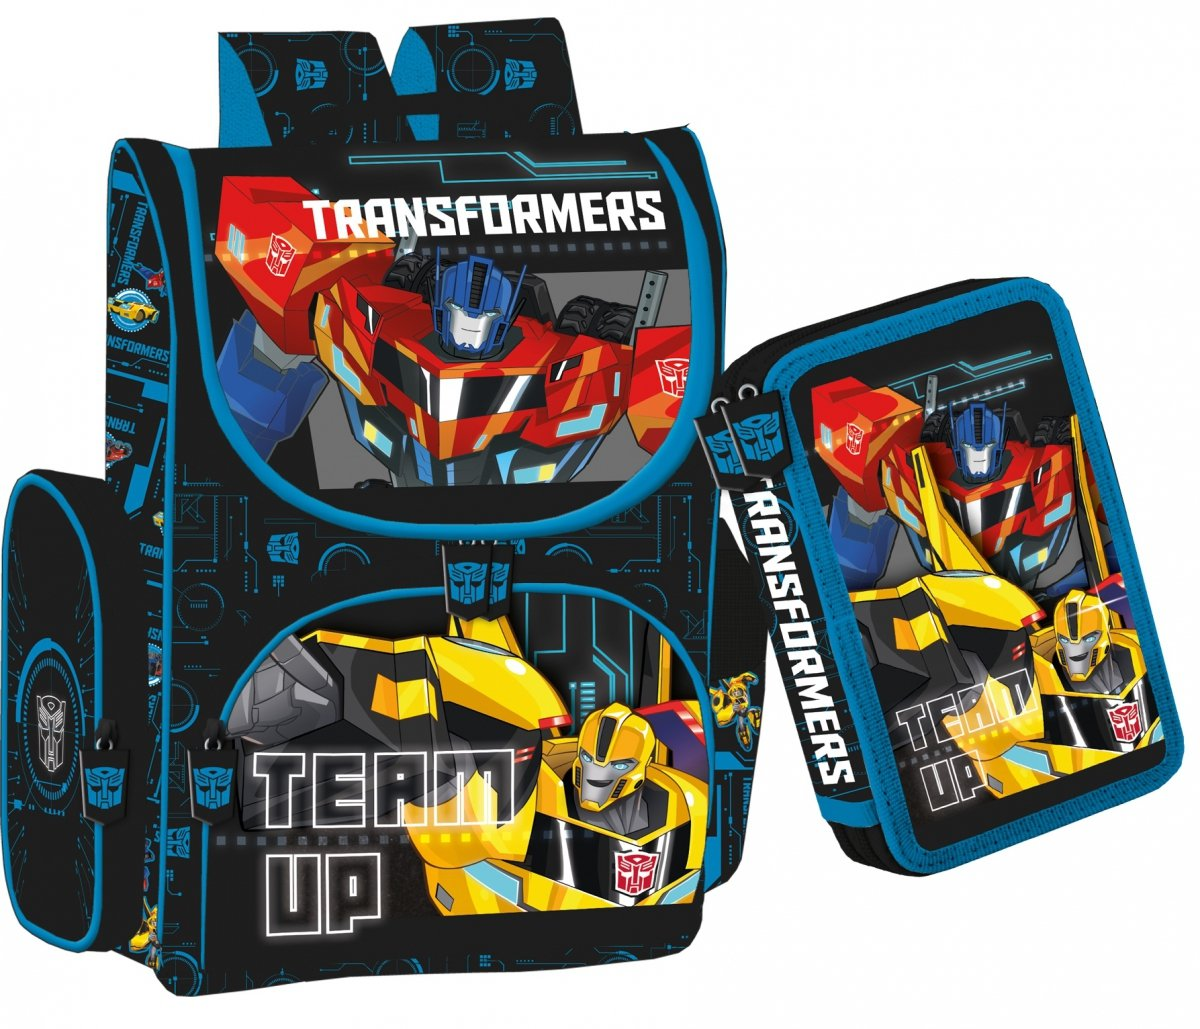 3b3ddc580534b Transformers TORNISTER Szkolny + Piórnik ZESTAW - Tornistry ...